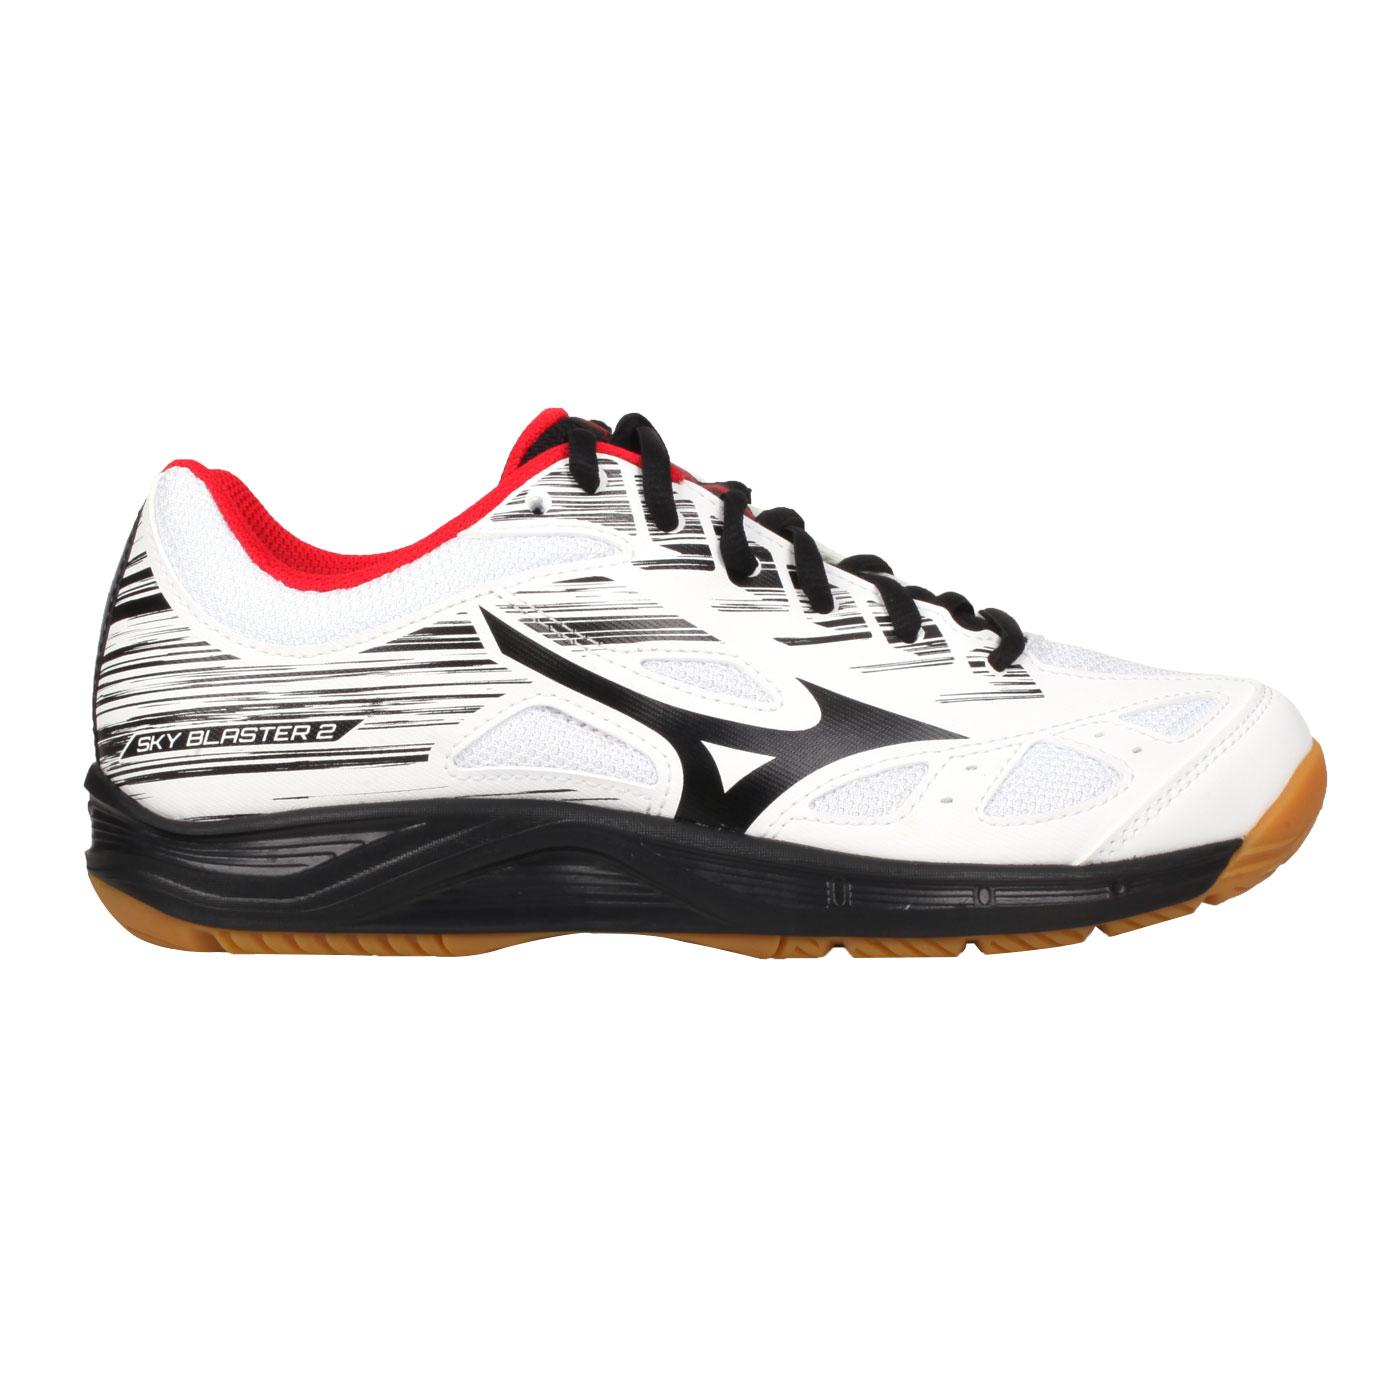 MIZUNO 男女羽球鞋  @SKY BLASTER 2@71GA204509 - 白黑紅